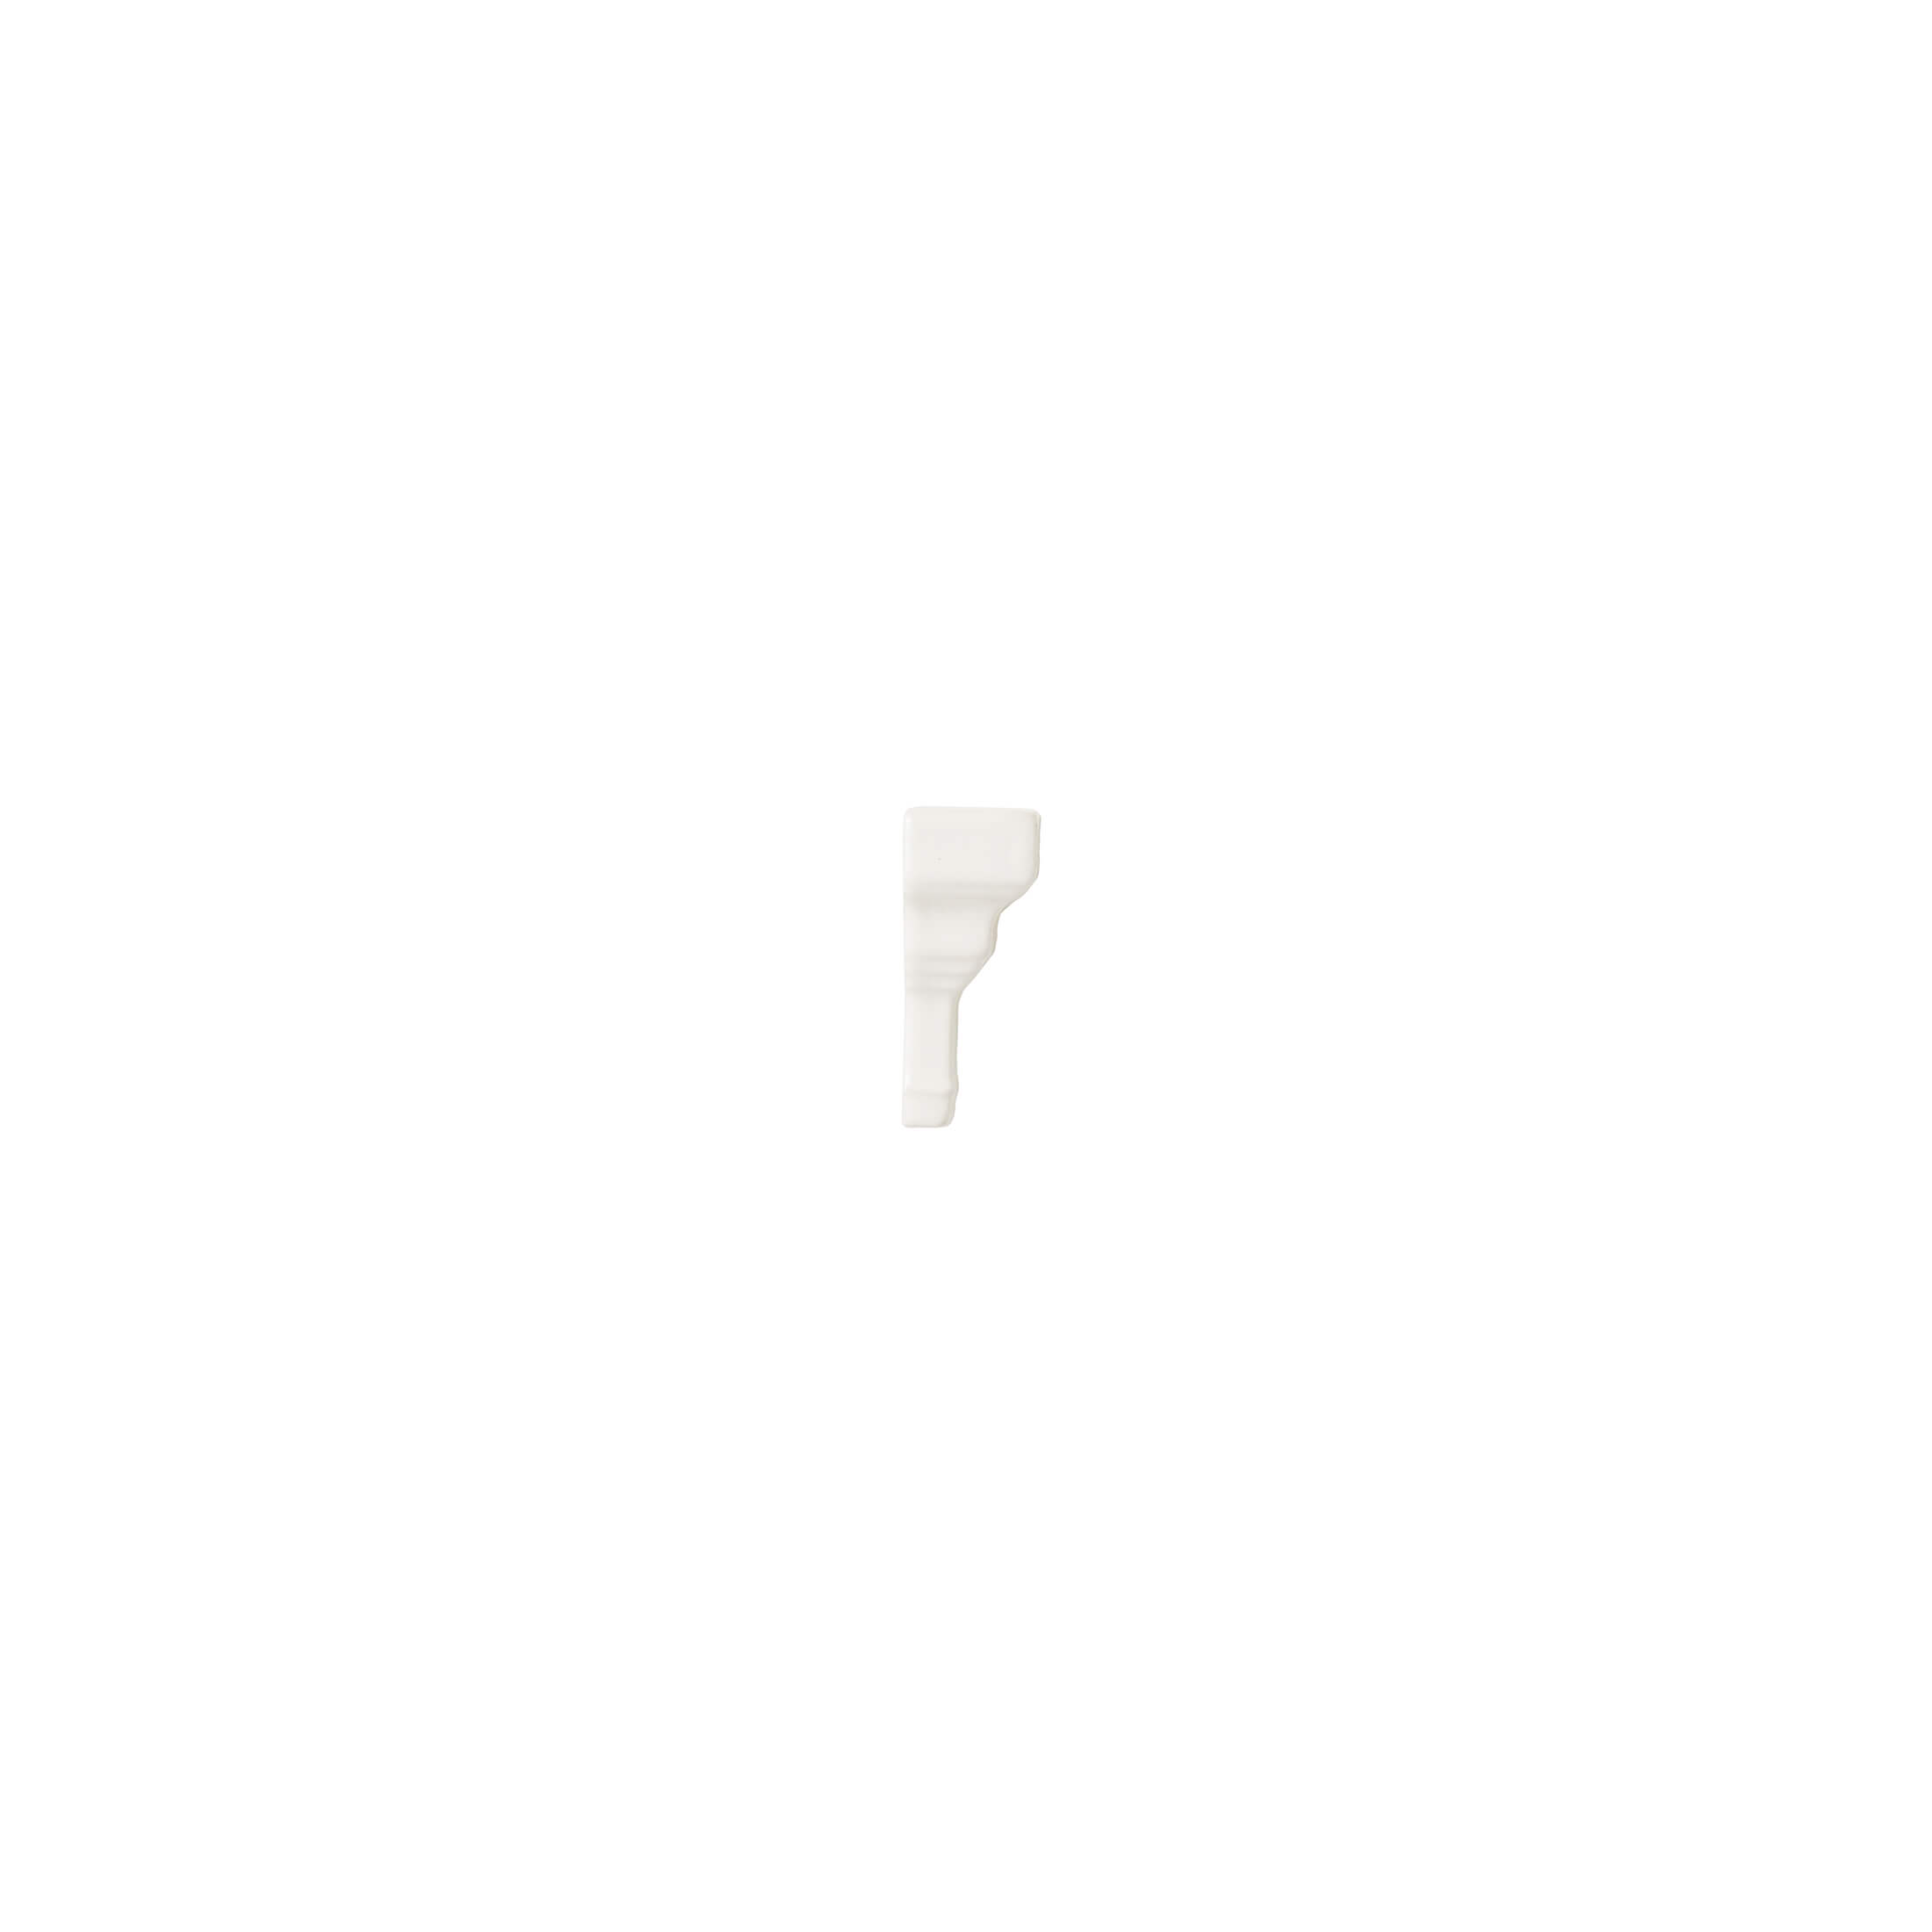 ADNE5470 - ANGULO EXTERIOR CORNISACLASICA - 5 cm X 20 cm